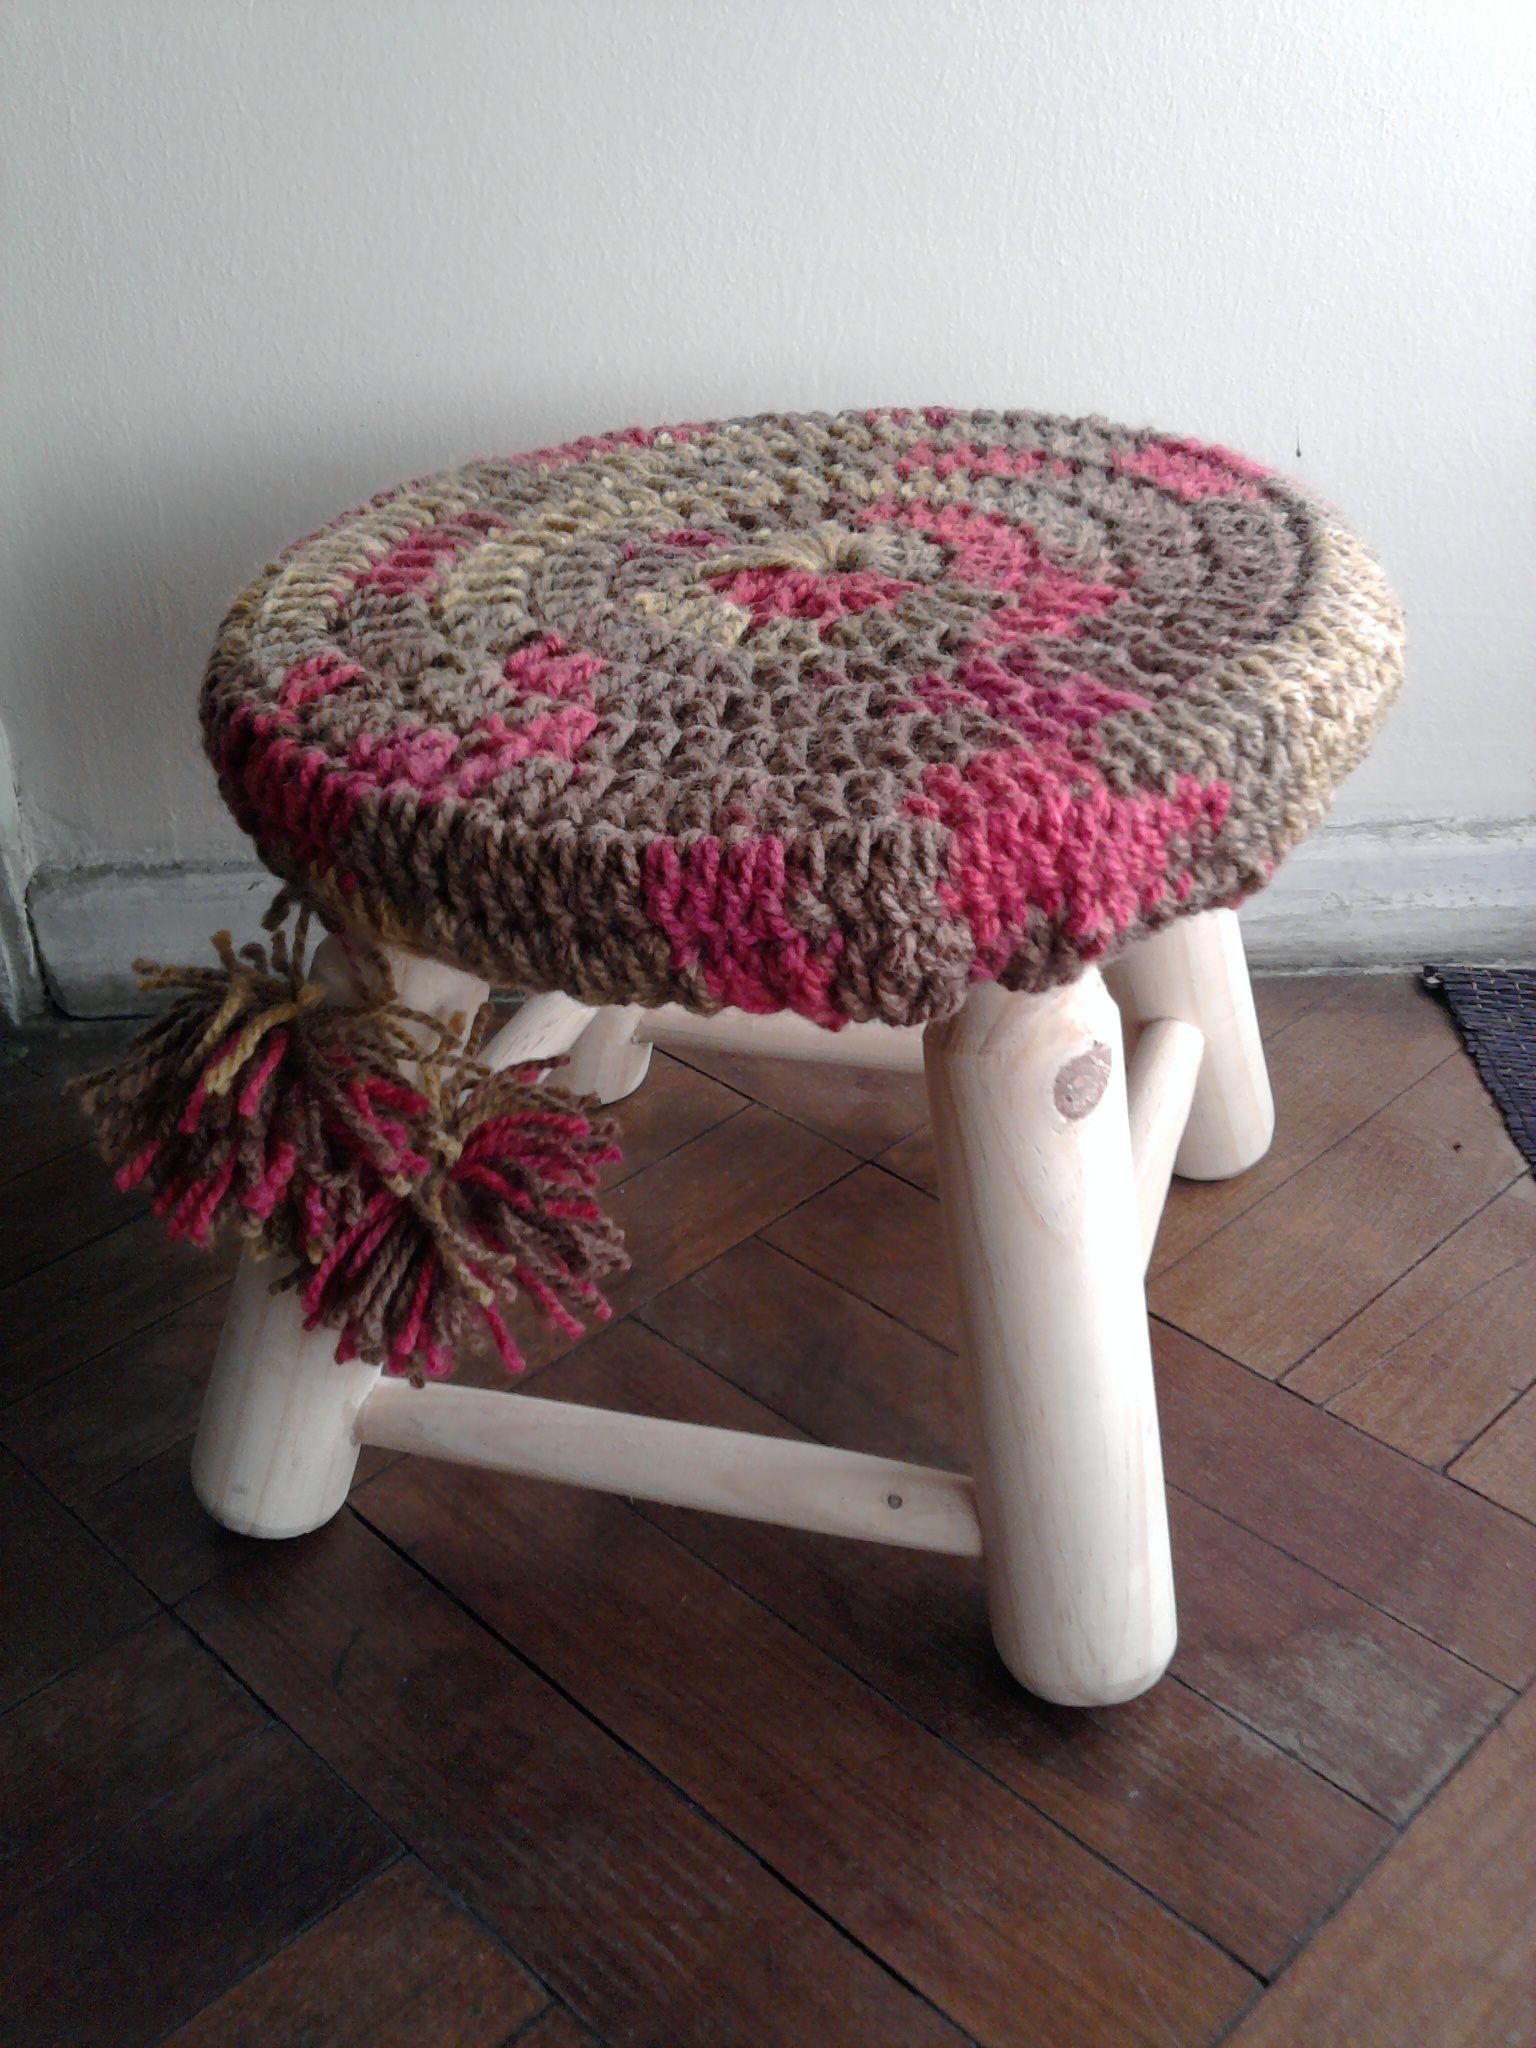 banquito adornado con crochet | Crochet | Pinterest | Adornar ...